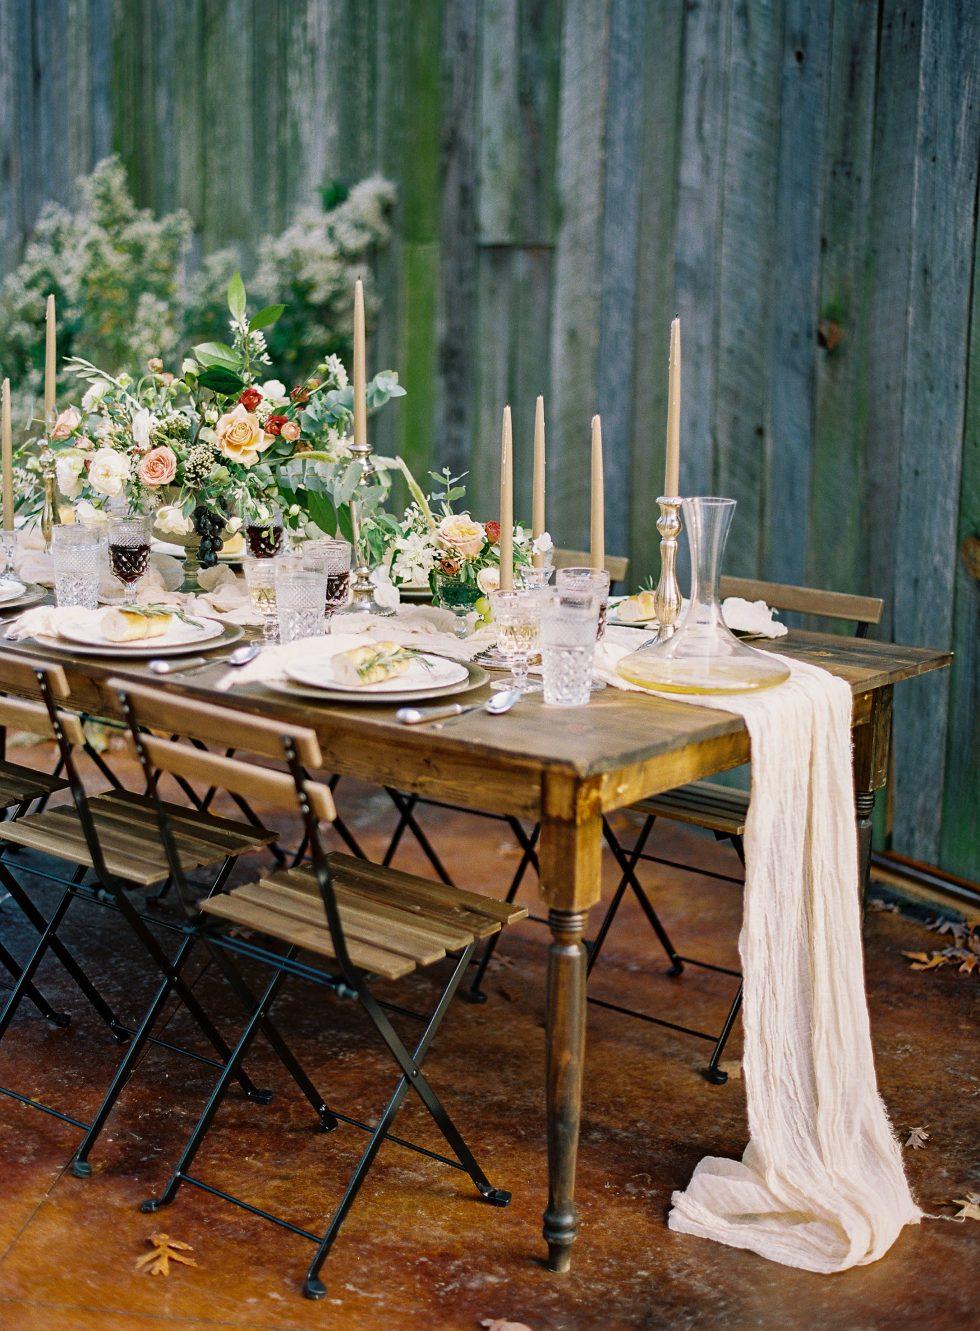 Summerfield-Farms-Outdoor-Fall-Wedding003